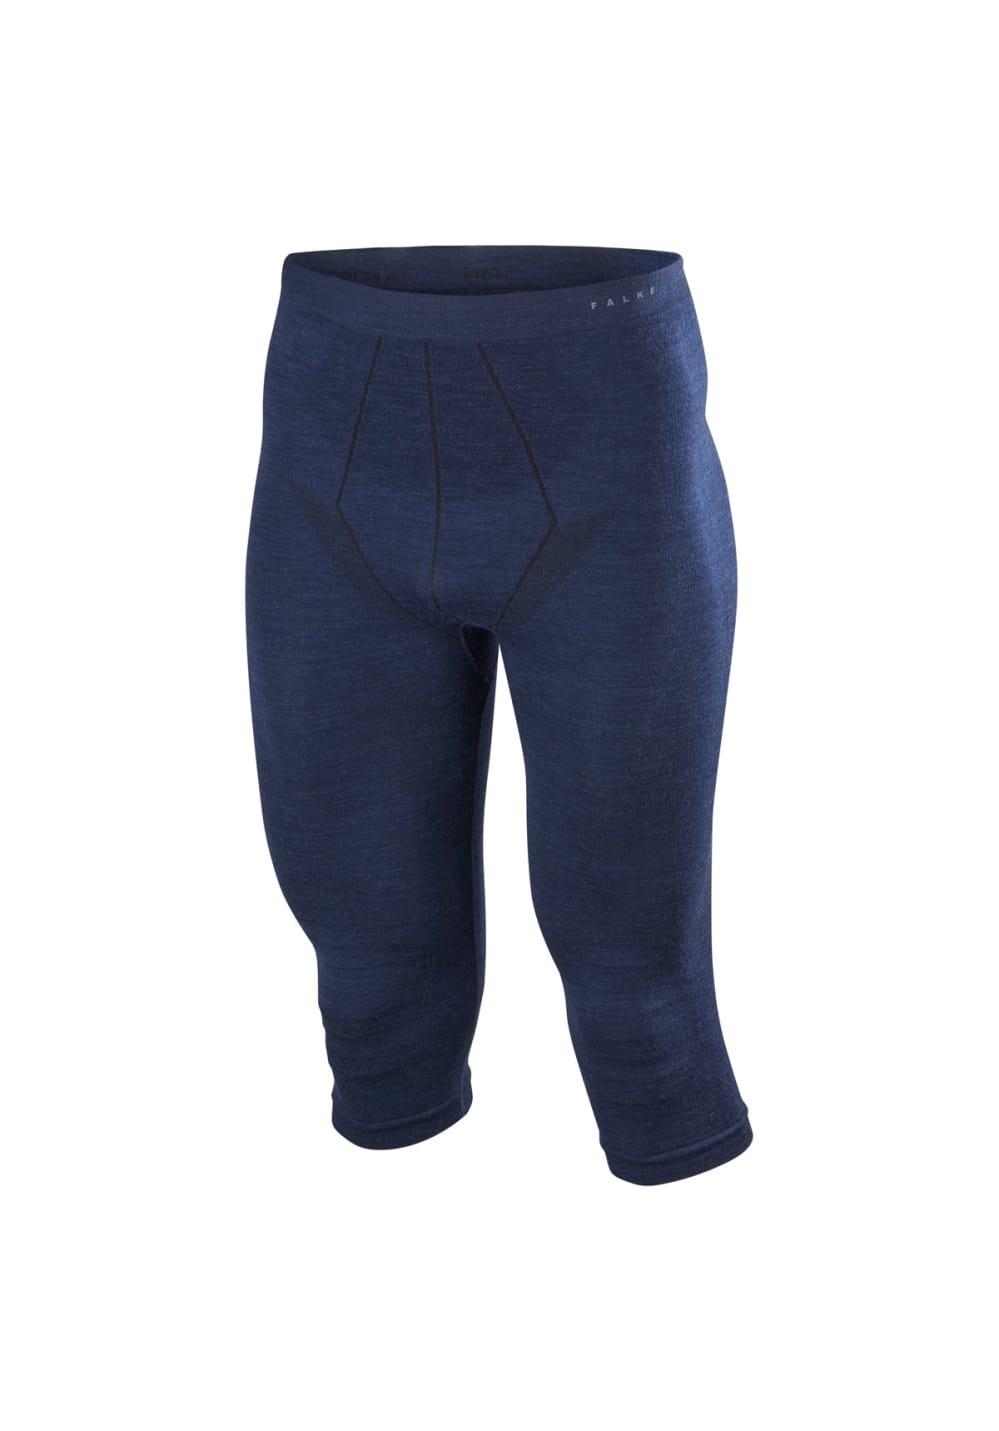 830753cd9 Falke Wool-tech 3 4 Tights - Running trousers for Men - Blue